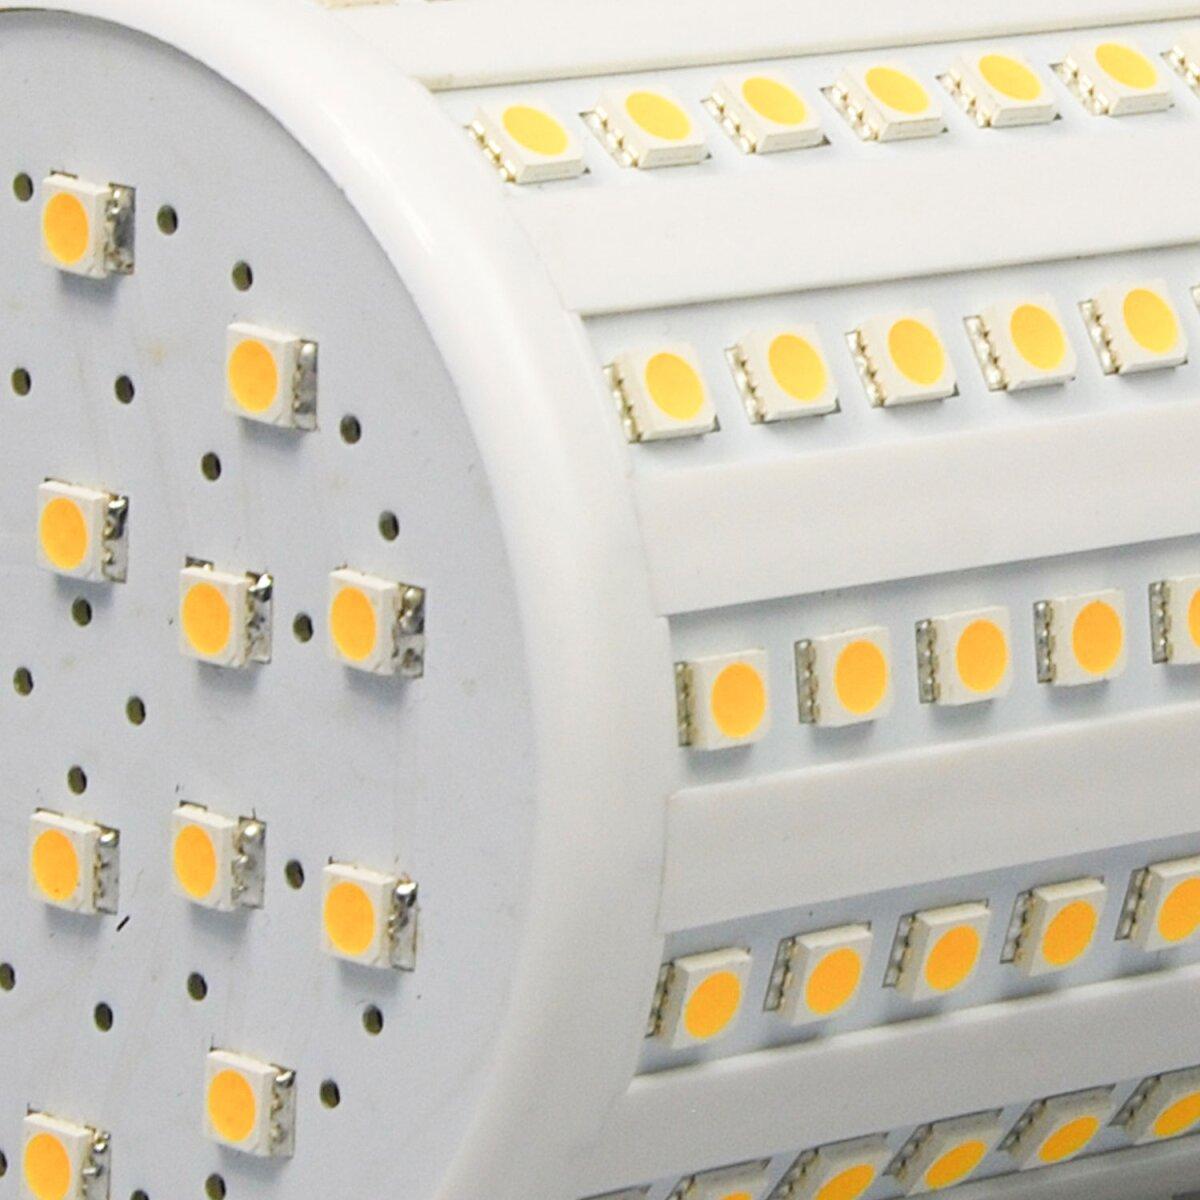 led retrofit e27 corn leuchtmittel 136smd 20w kaltwei ledxess i 26 95. Black Bedroom Furniture Sets. Home Design Ideas